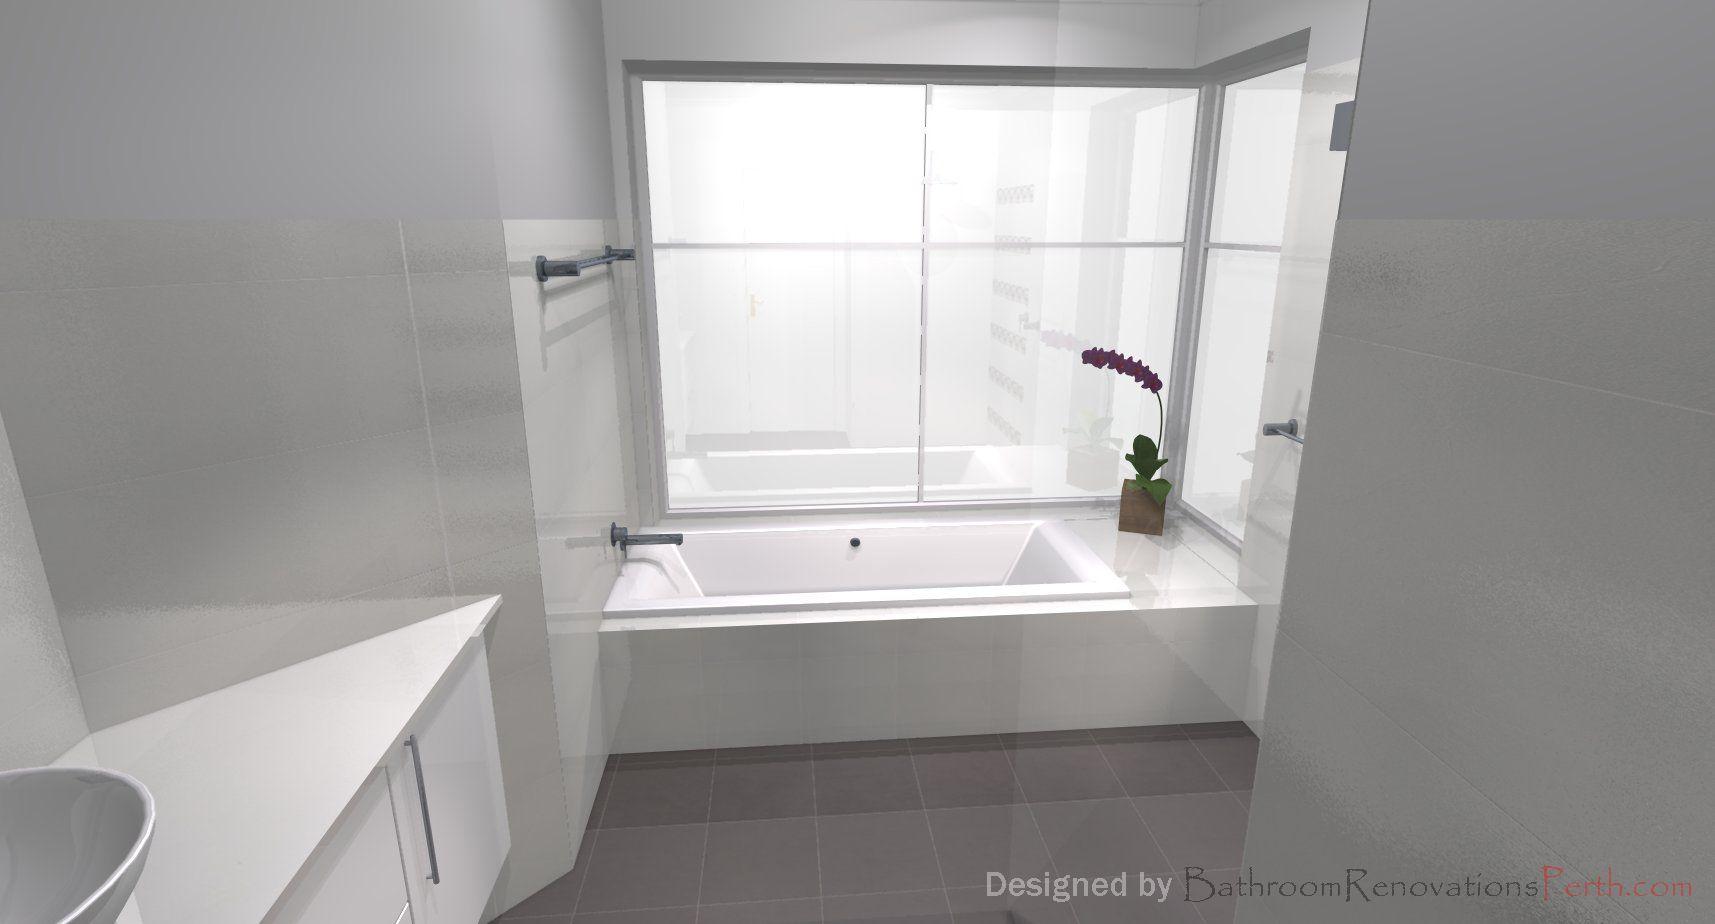 Designed by Bathroom Renovations Perth www.bathroomrenovationsperth ...